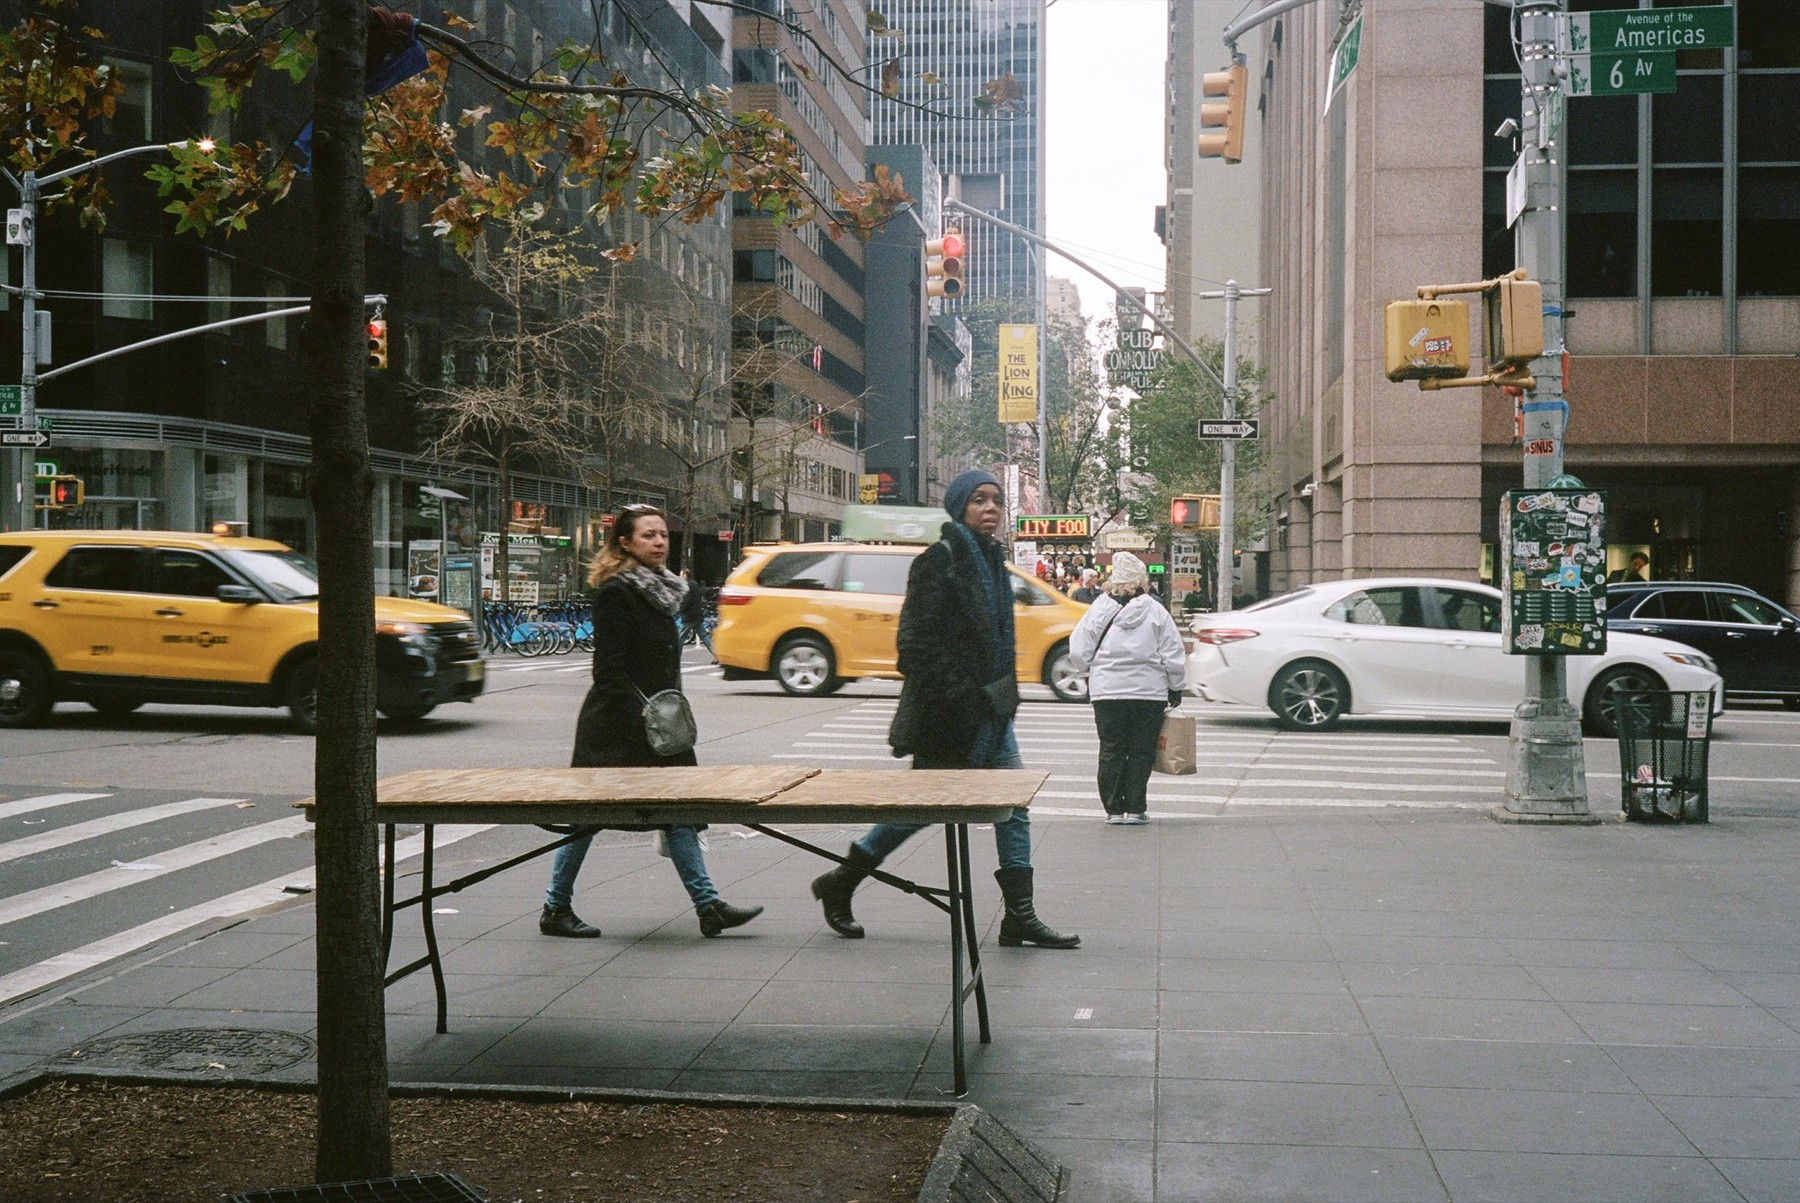 3-person-trafficlight-person-trafficlight-diningtable.jpg